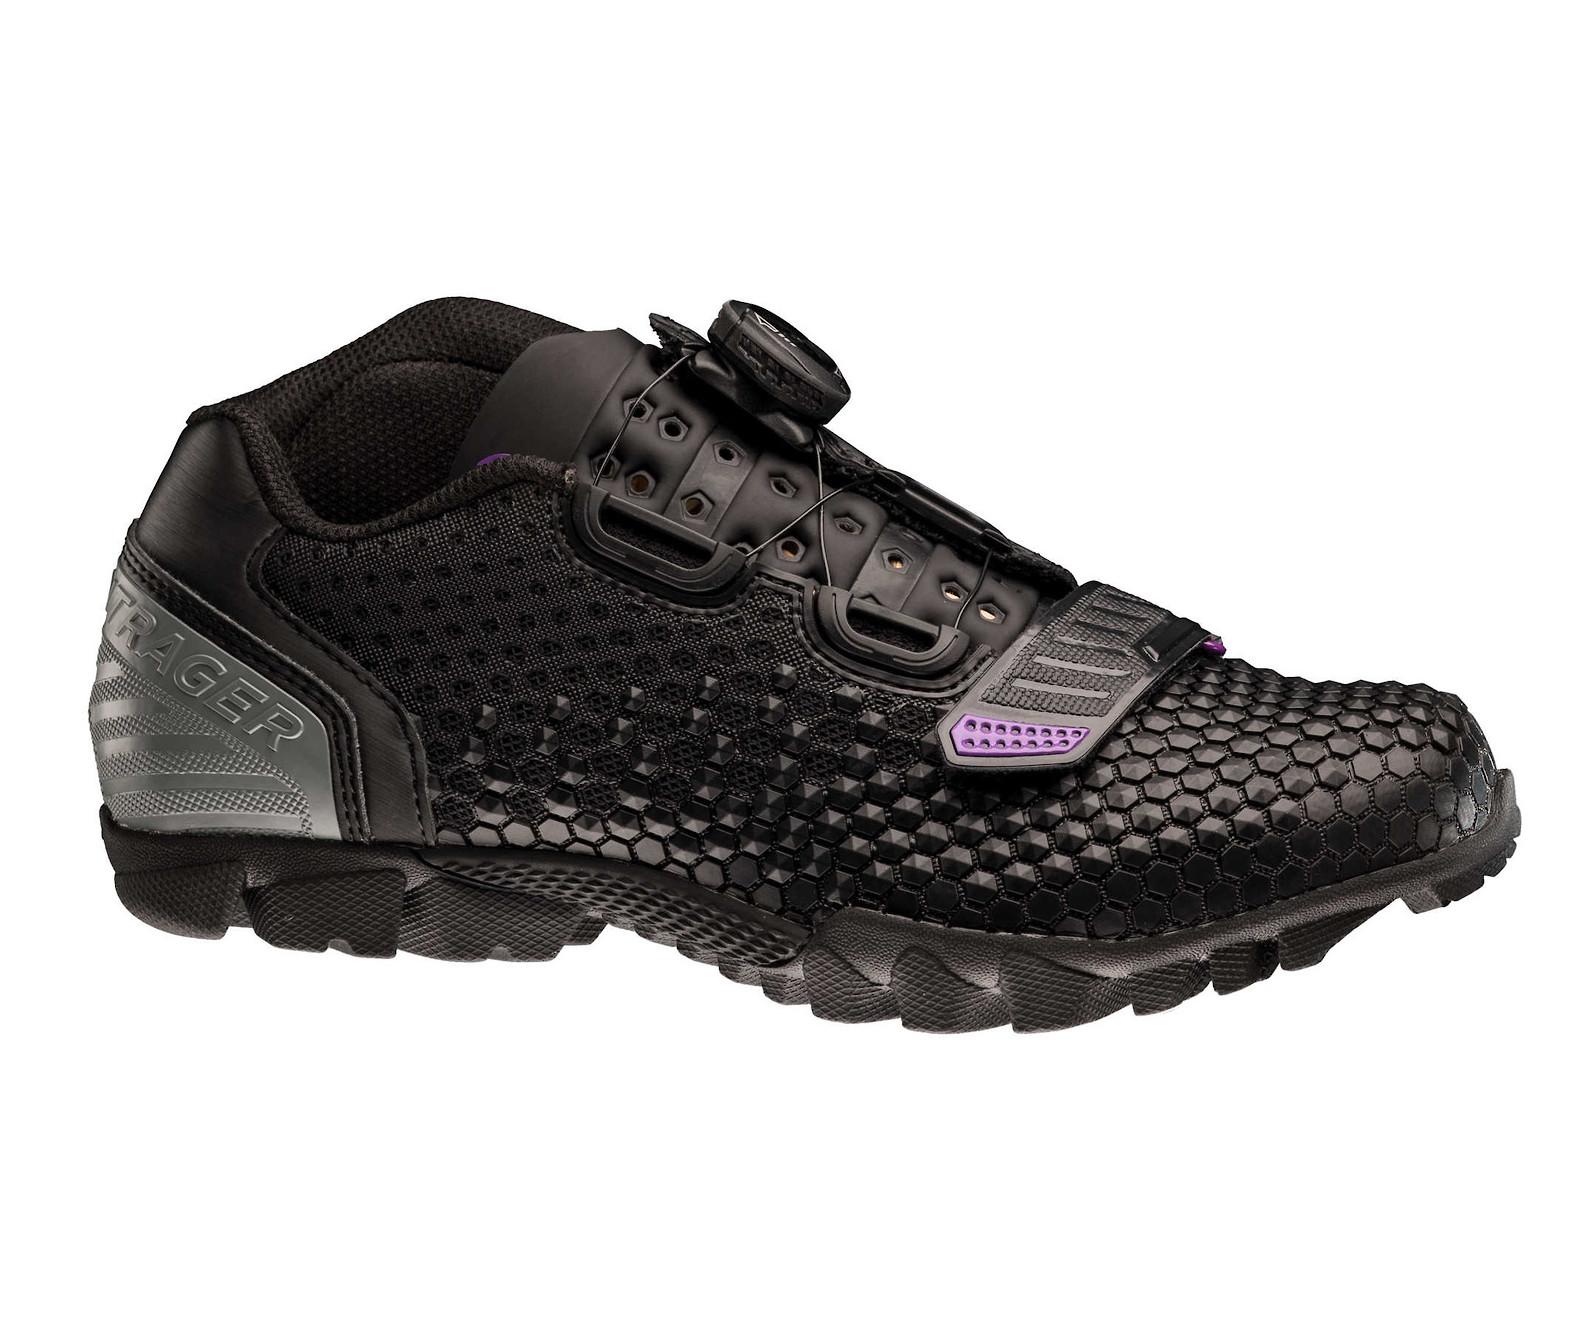 Bontrager Tario Women's Mountain Shoe (Black)